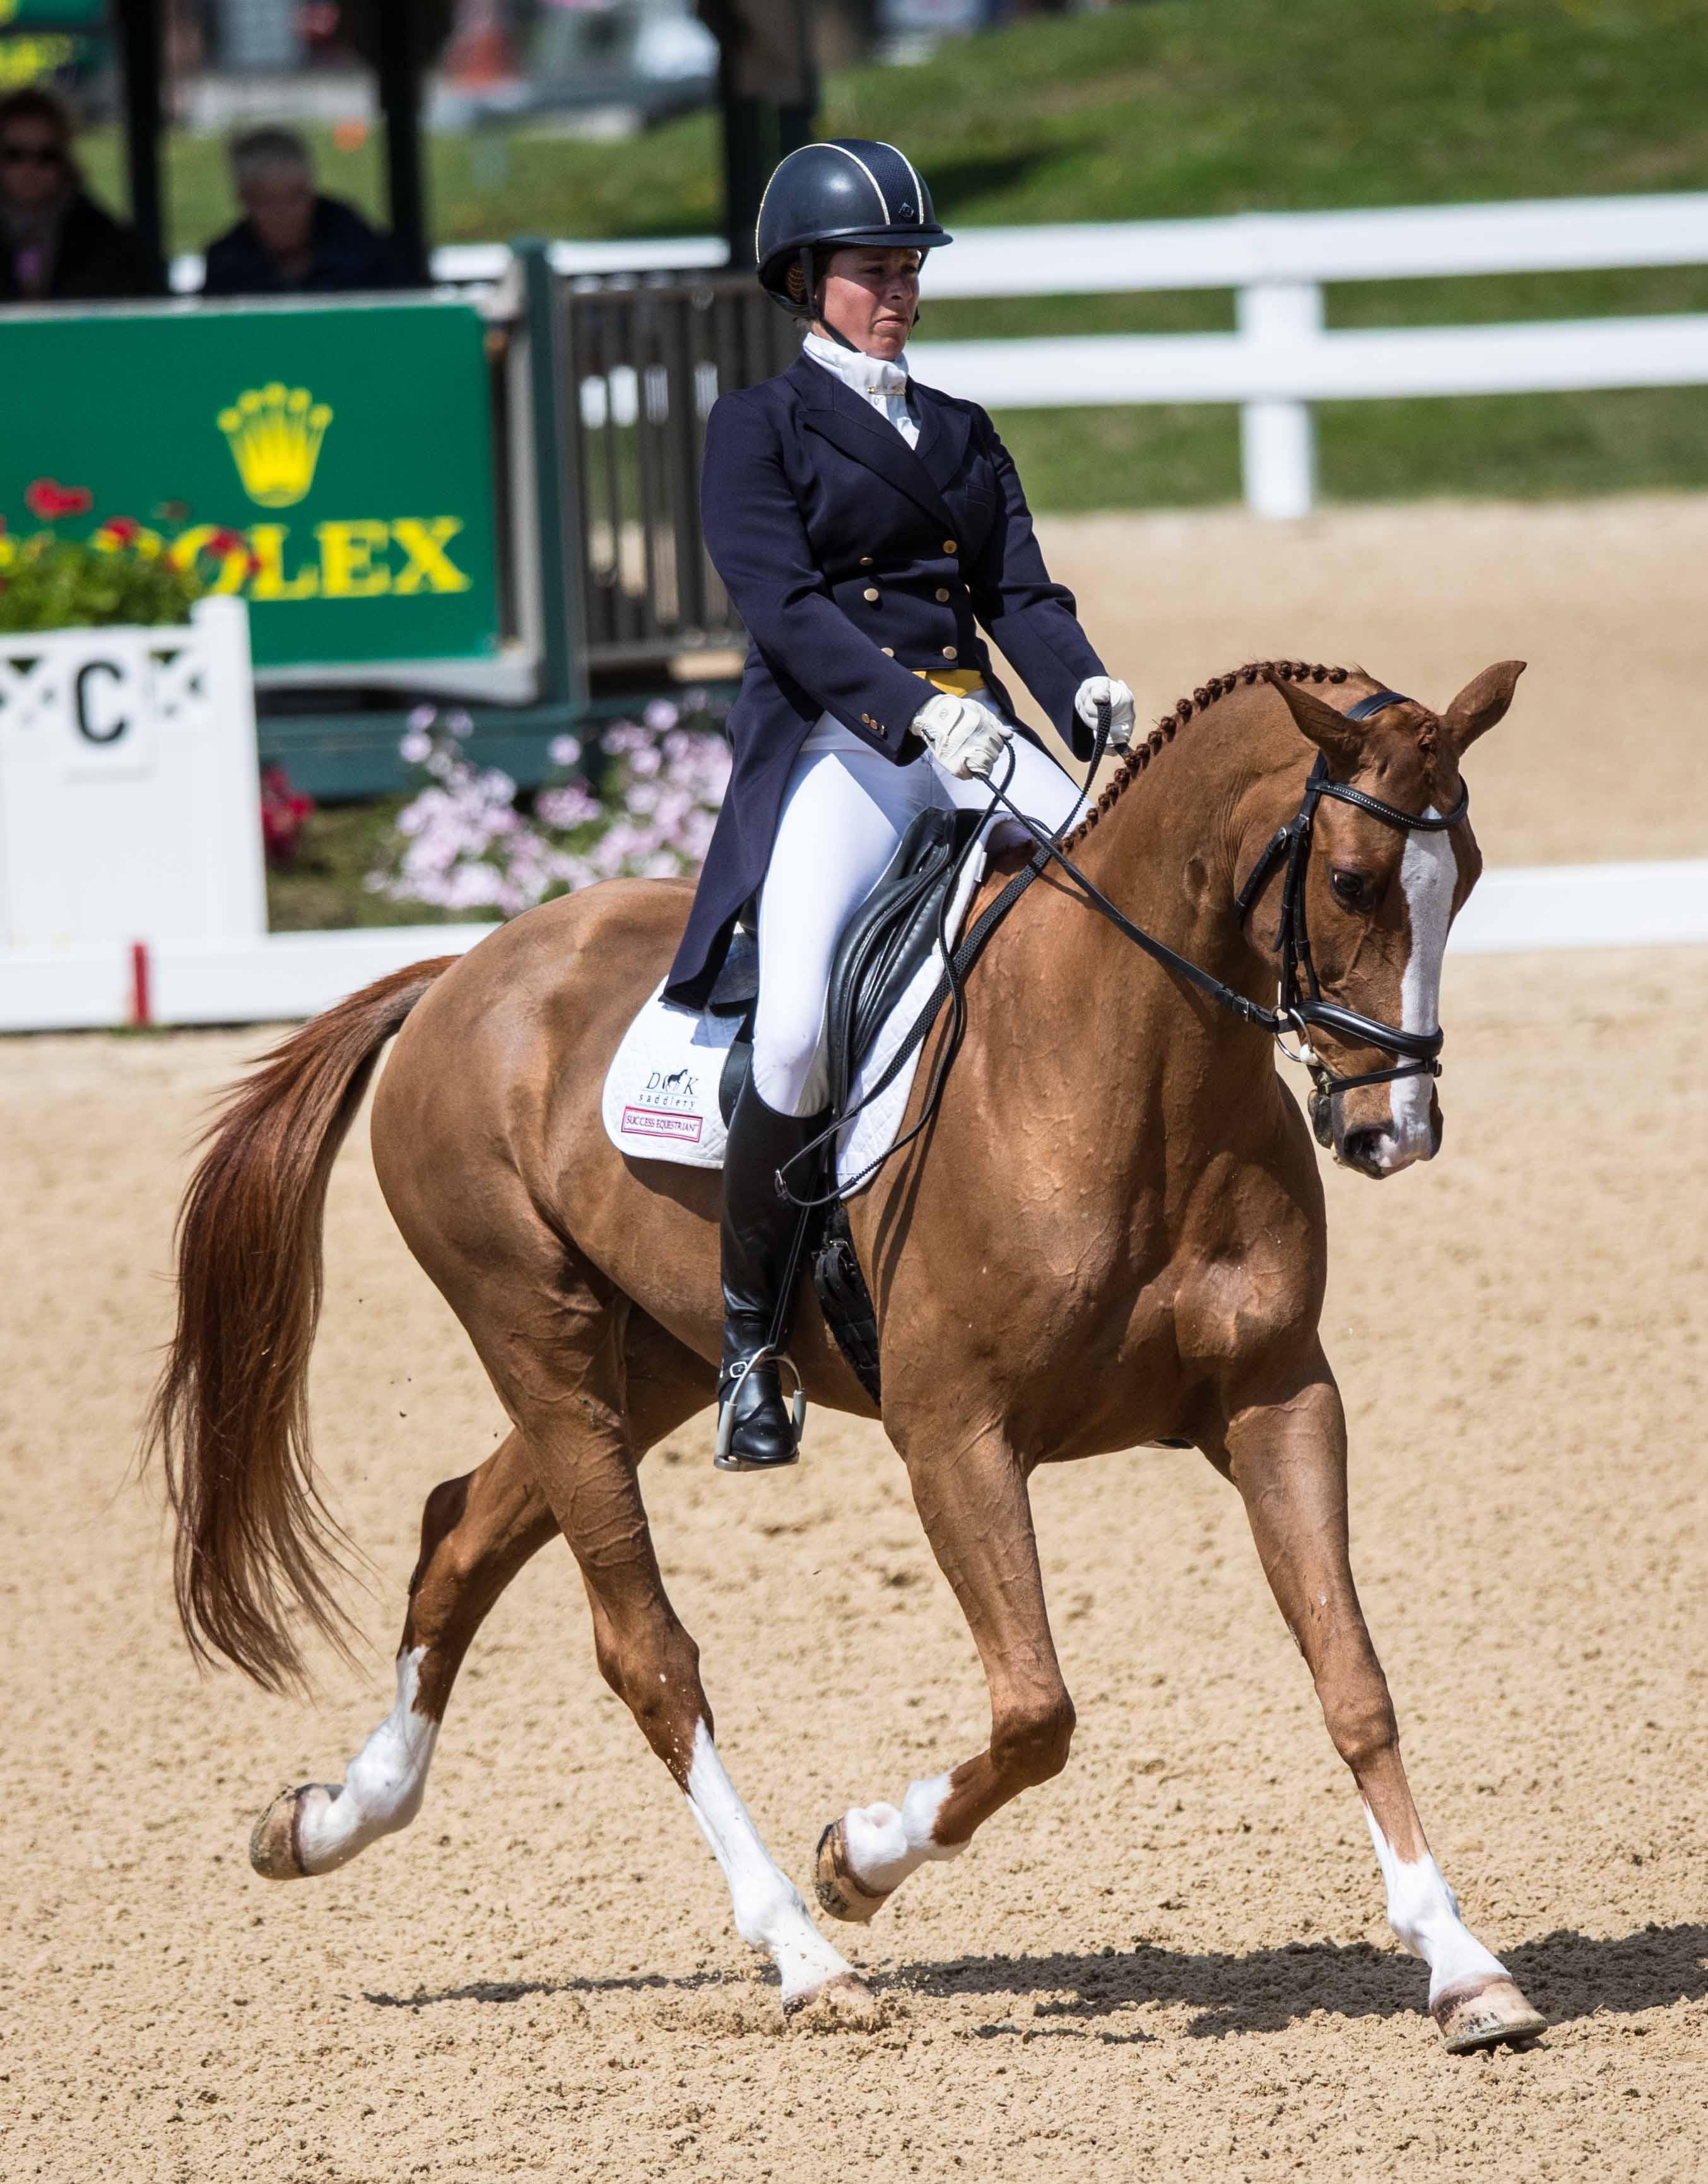 Success Equestrian Rider Lillian Heard